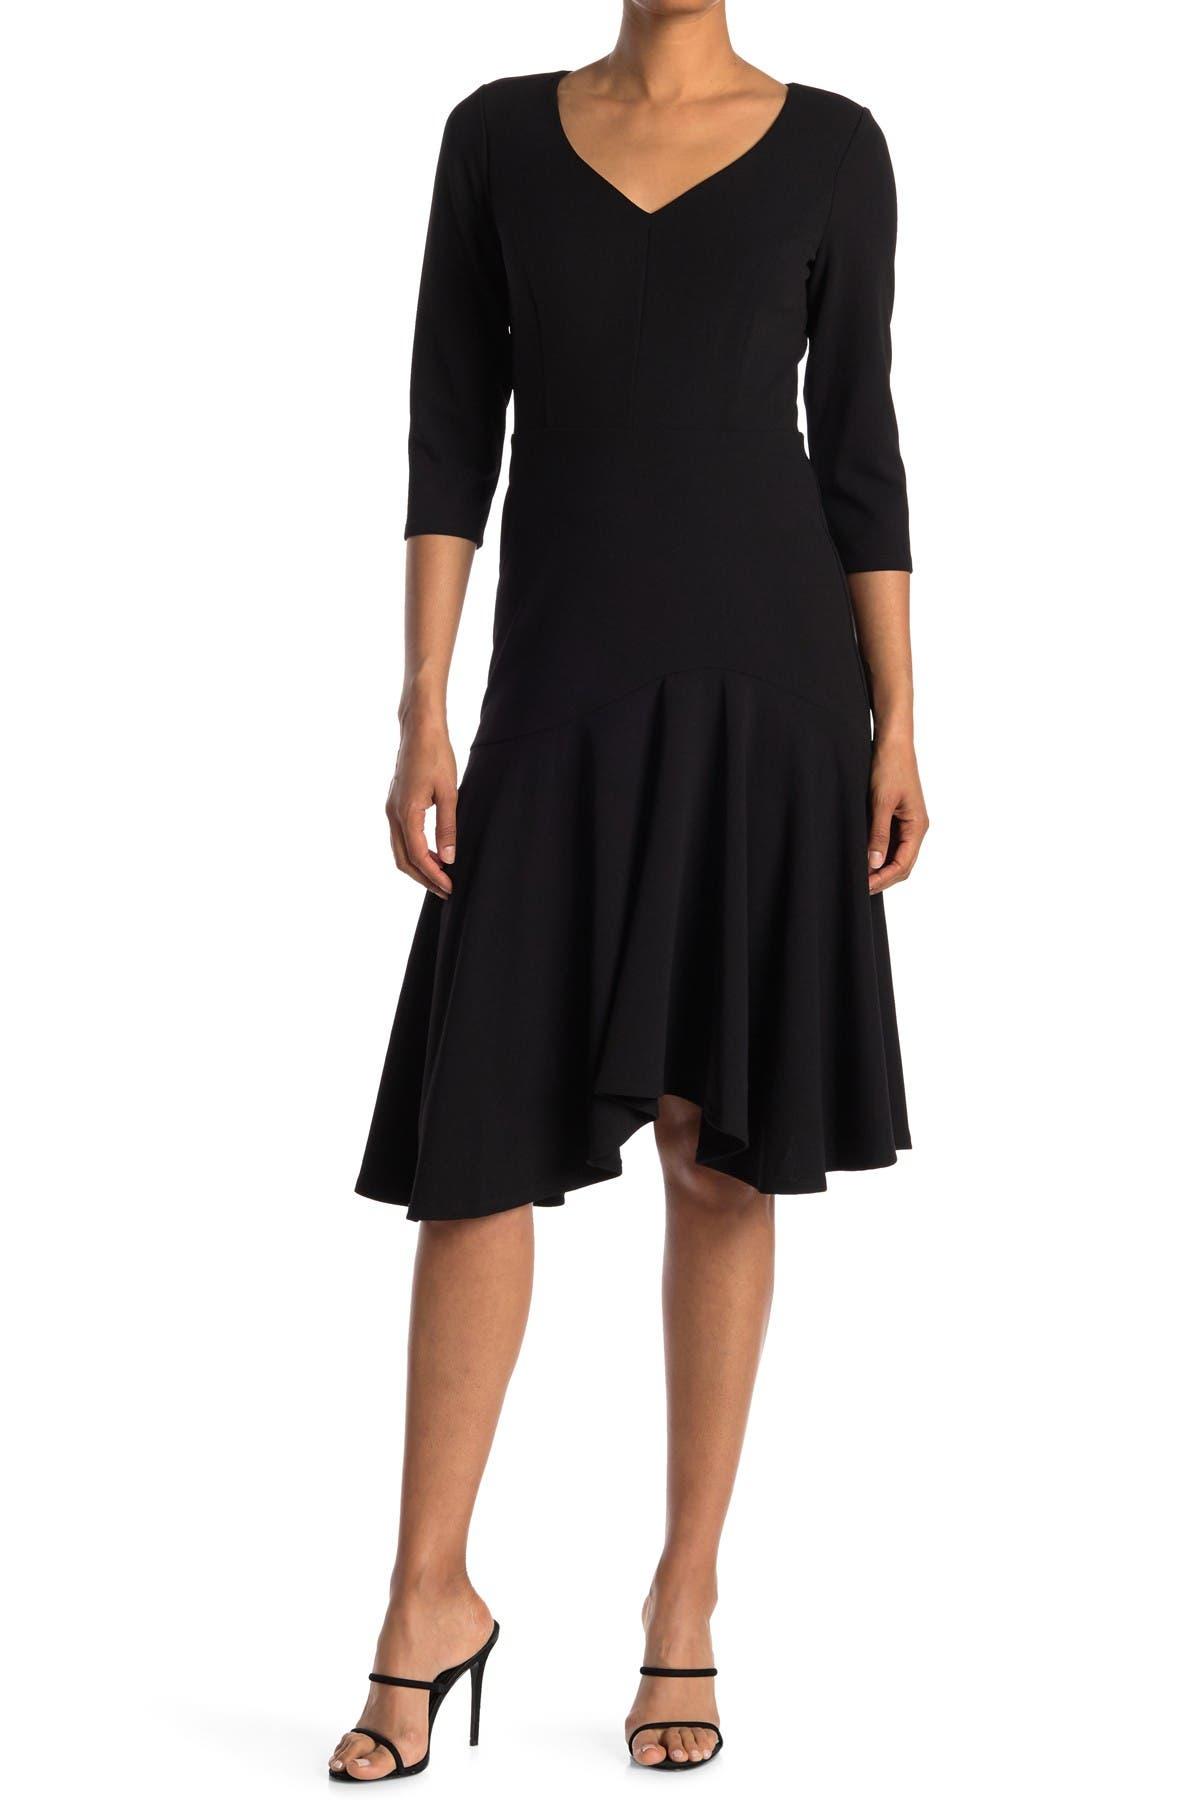 Image of HALSTON Elbow Sleeve Wide V-Neck Flounce Dress